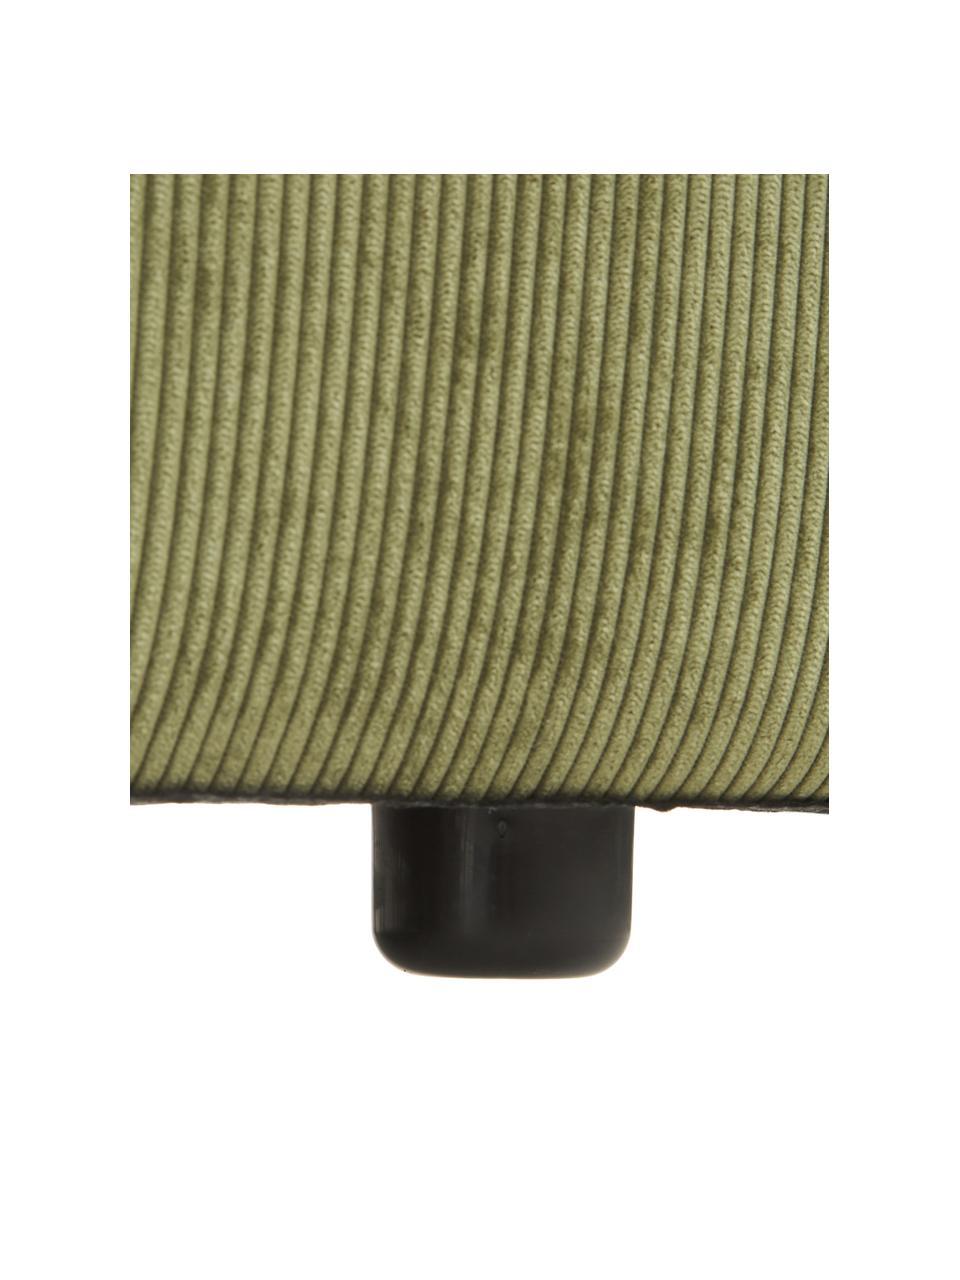 Sofa-Hocker Lennon in Grün aus Cord, Bezug: Cord (92% Polyester, 8% P, Gestell: Massives Kiefernholz, Spe, Füße: Kunststoff Die Füße befin, Cord Grün, 88 x 43 cm